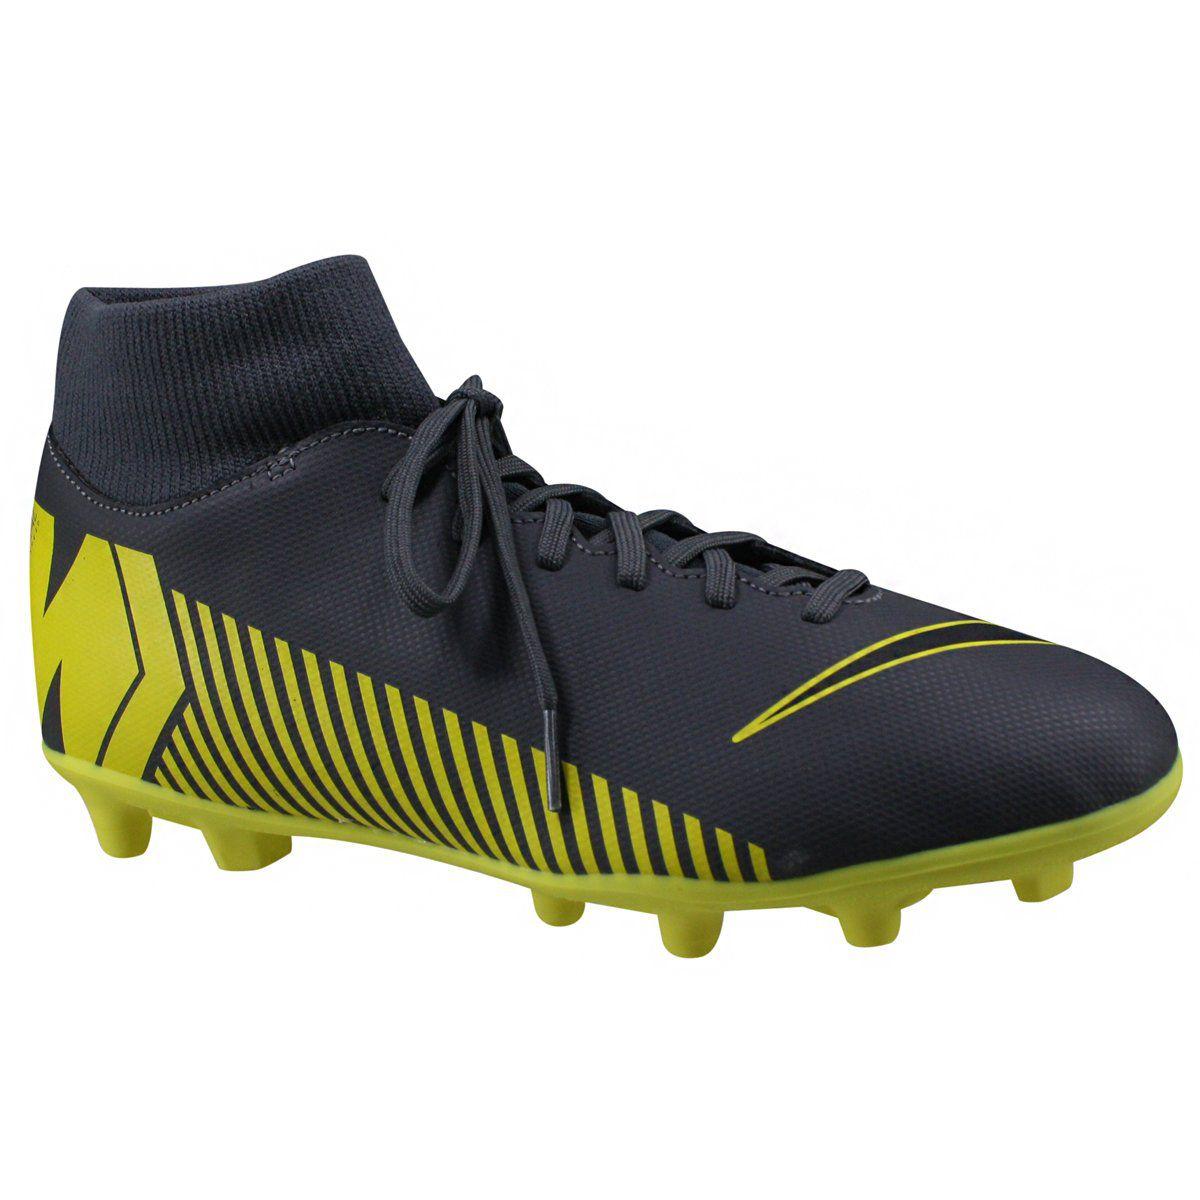 66761680ad254 Chuteira Campo Nike Mercurial Superfly 6 Club - BRACIA SHOP  Loja de ...